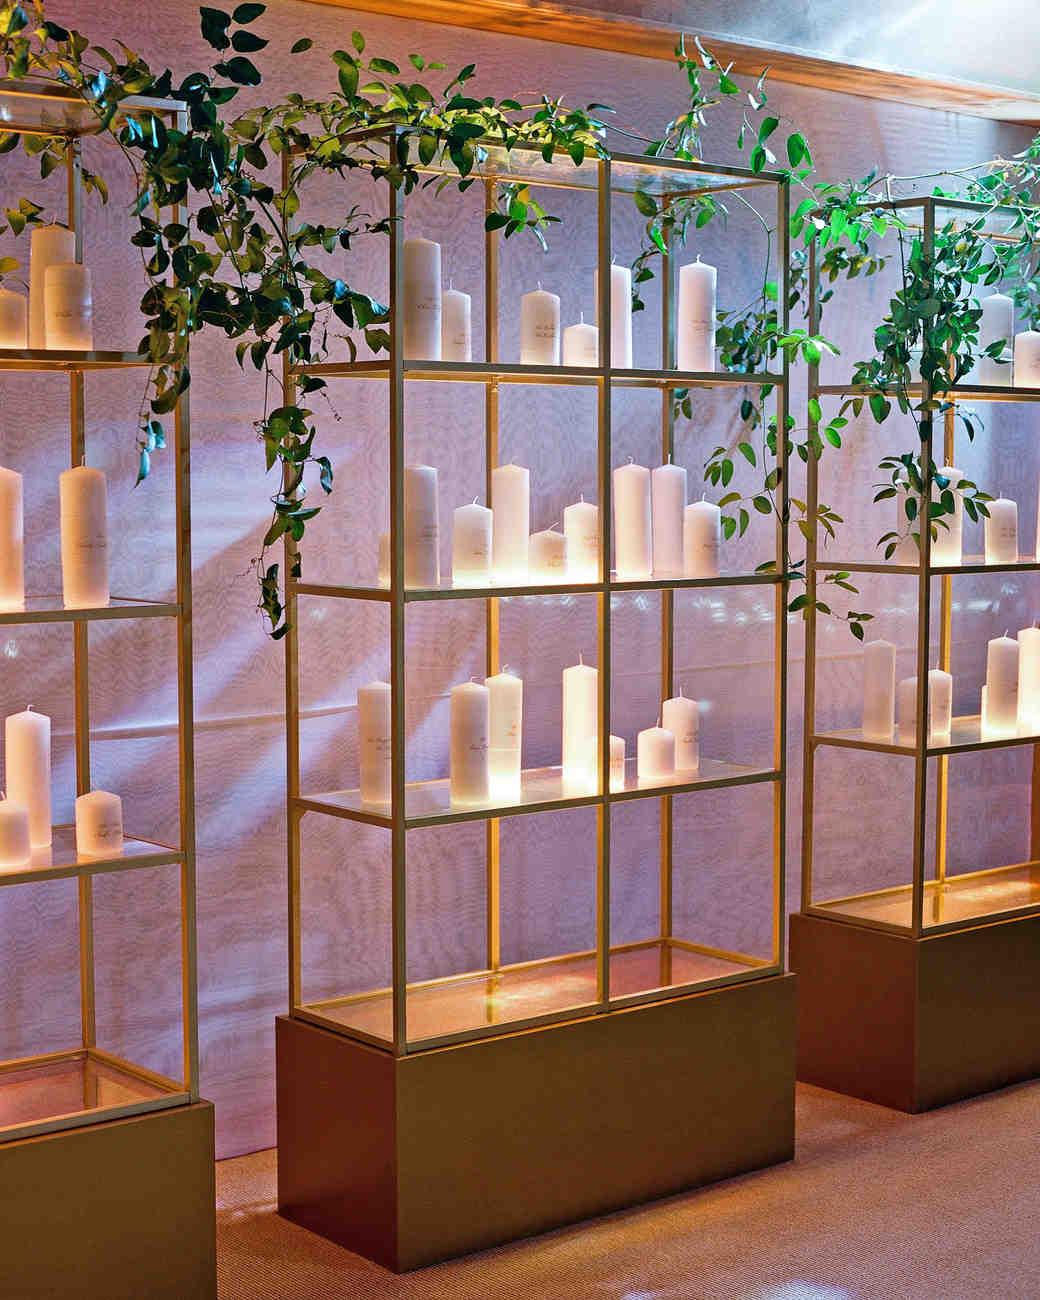 kelsey joc wedding santa barbara california candles escortcards 1629